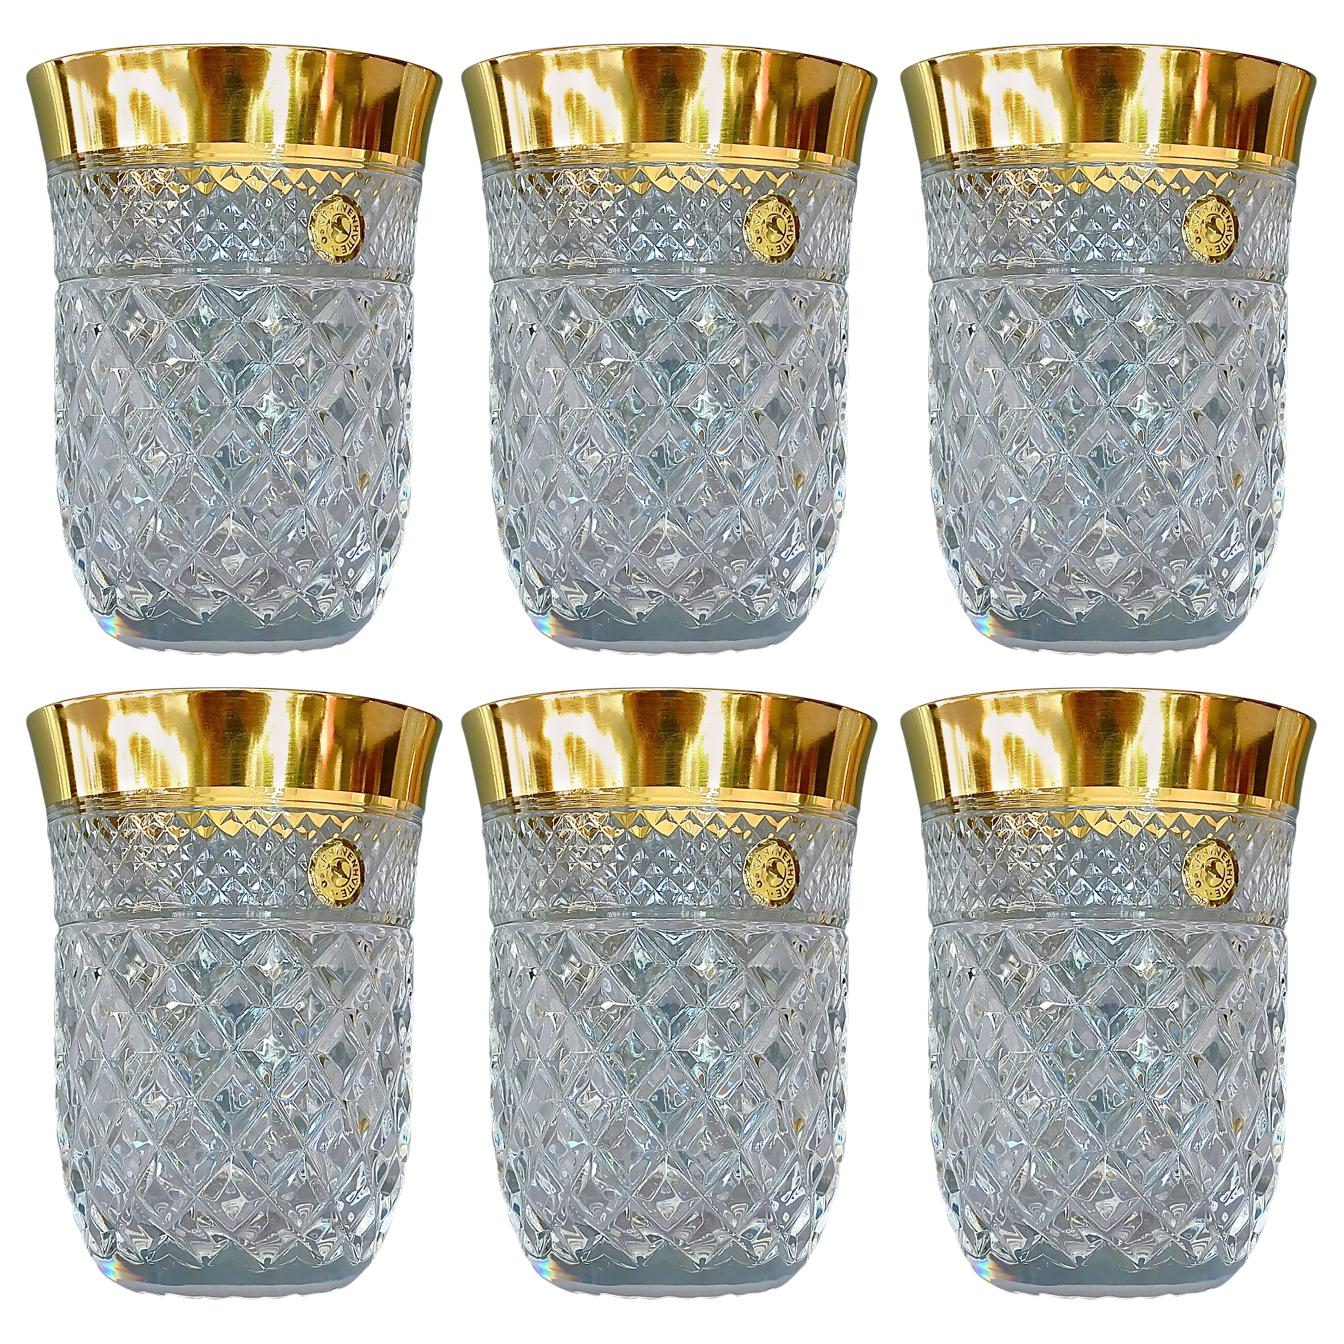 Precious 6 Water Glasses Gold Crystal Glass Tumbler Josephinenhuette Moser